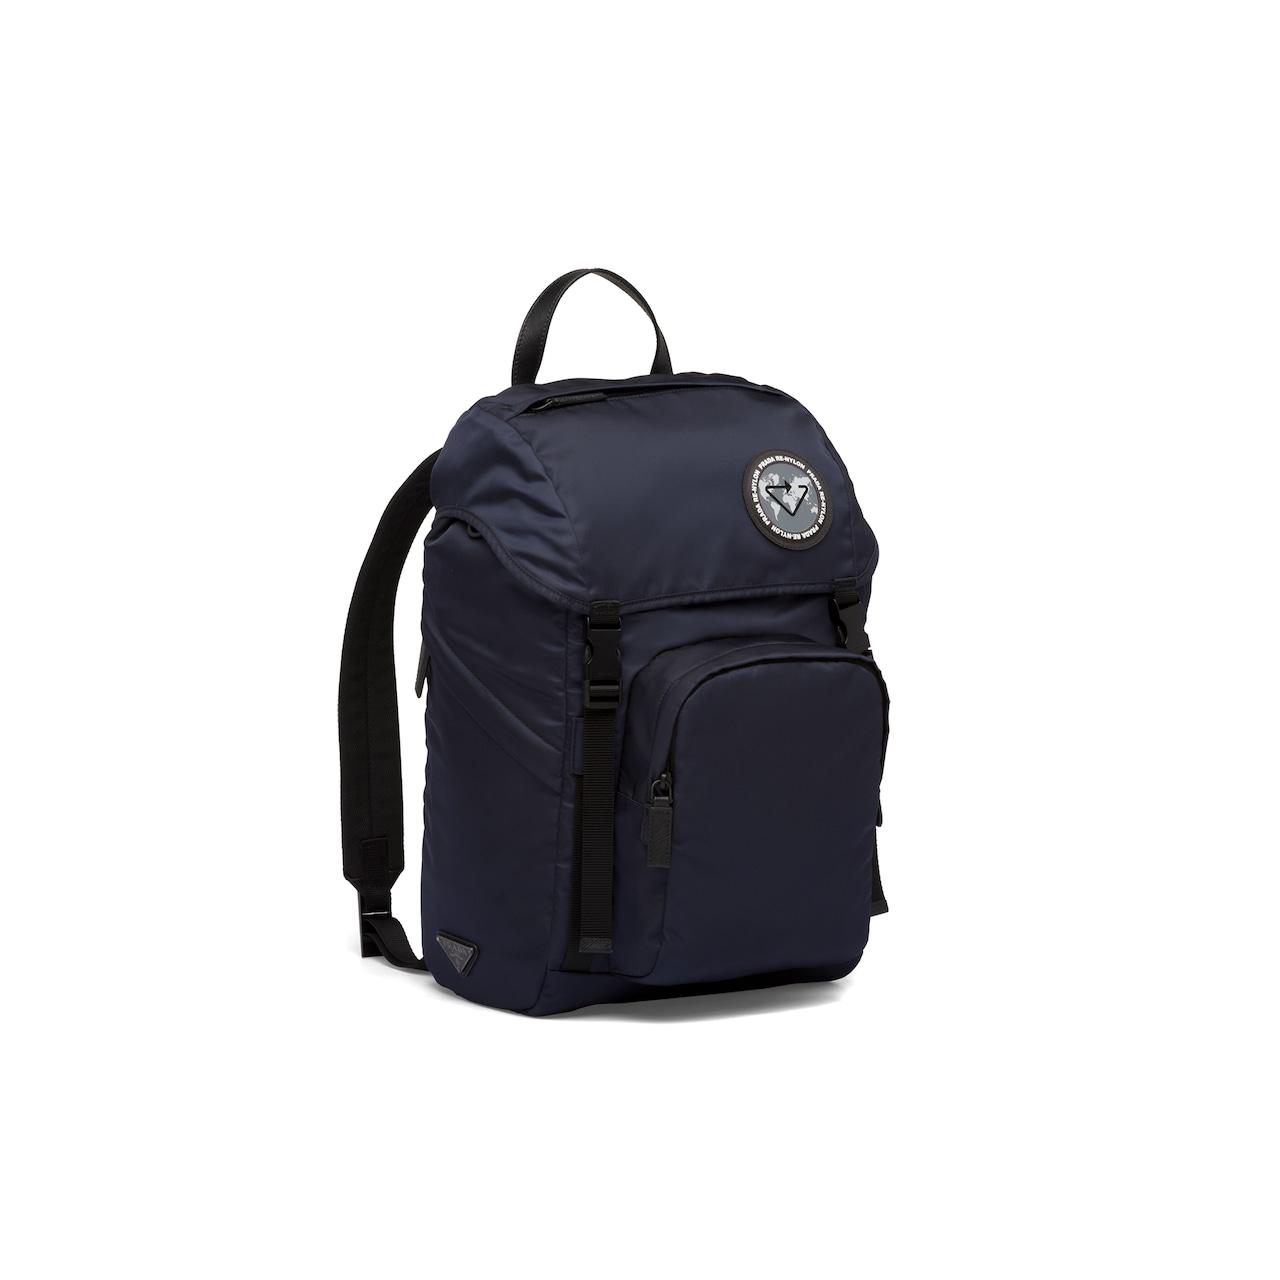 Prada Re-Nylon backpack